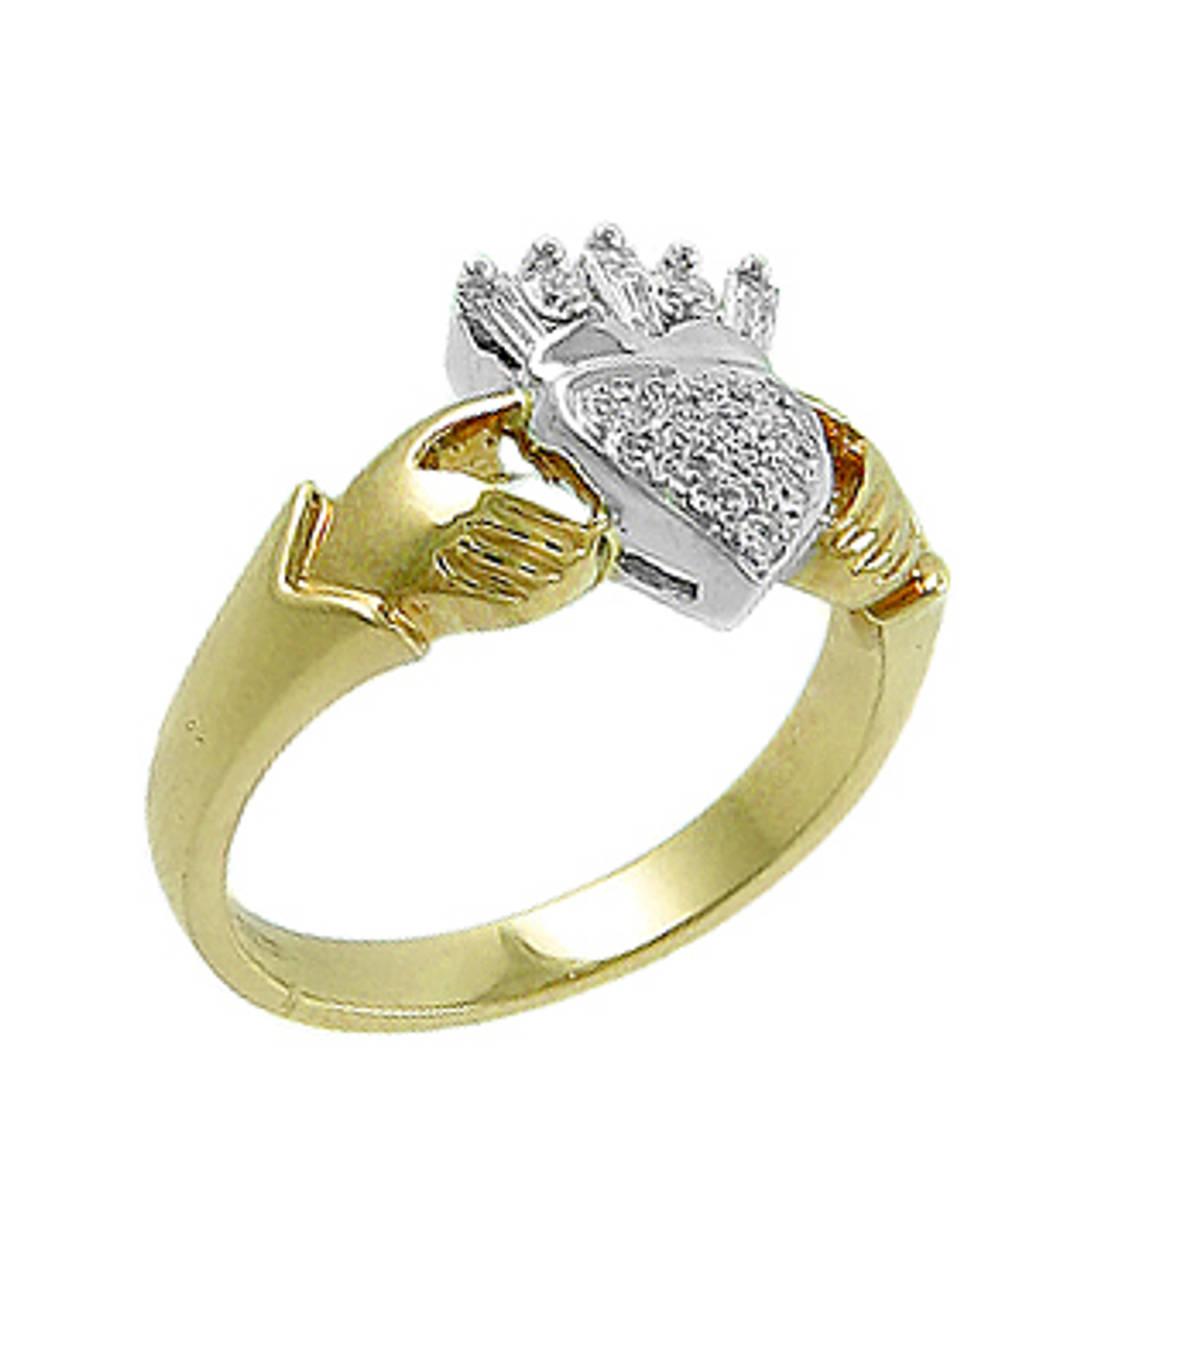 Irish made18 carat yellow gold 0.14cts/0.15cts diamonds claddagh engagement ring